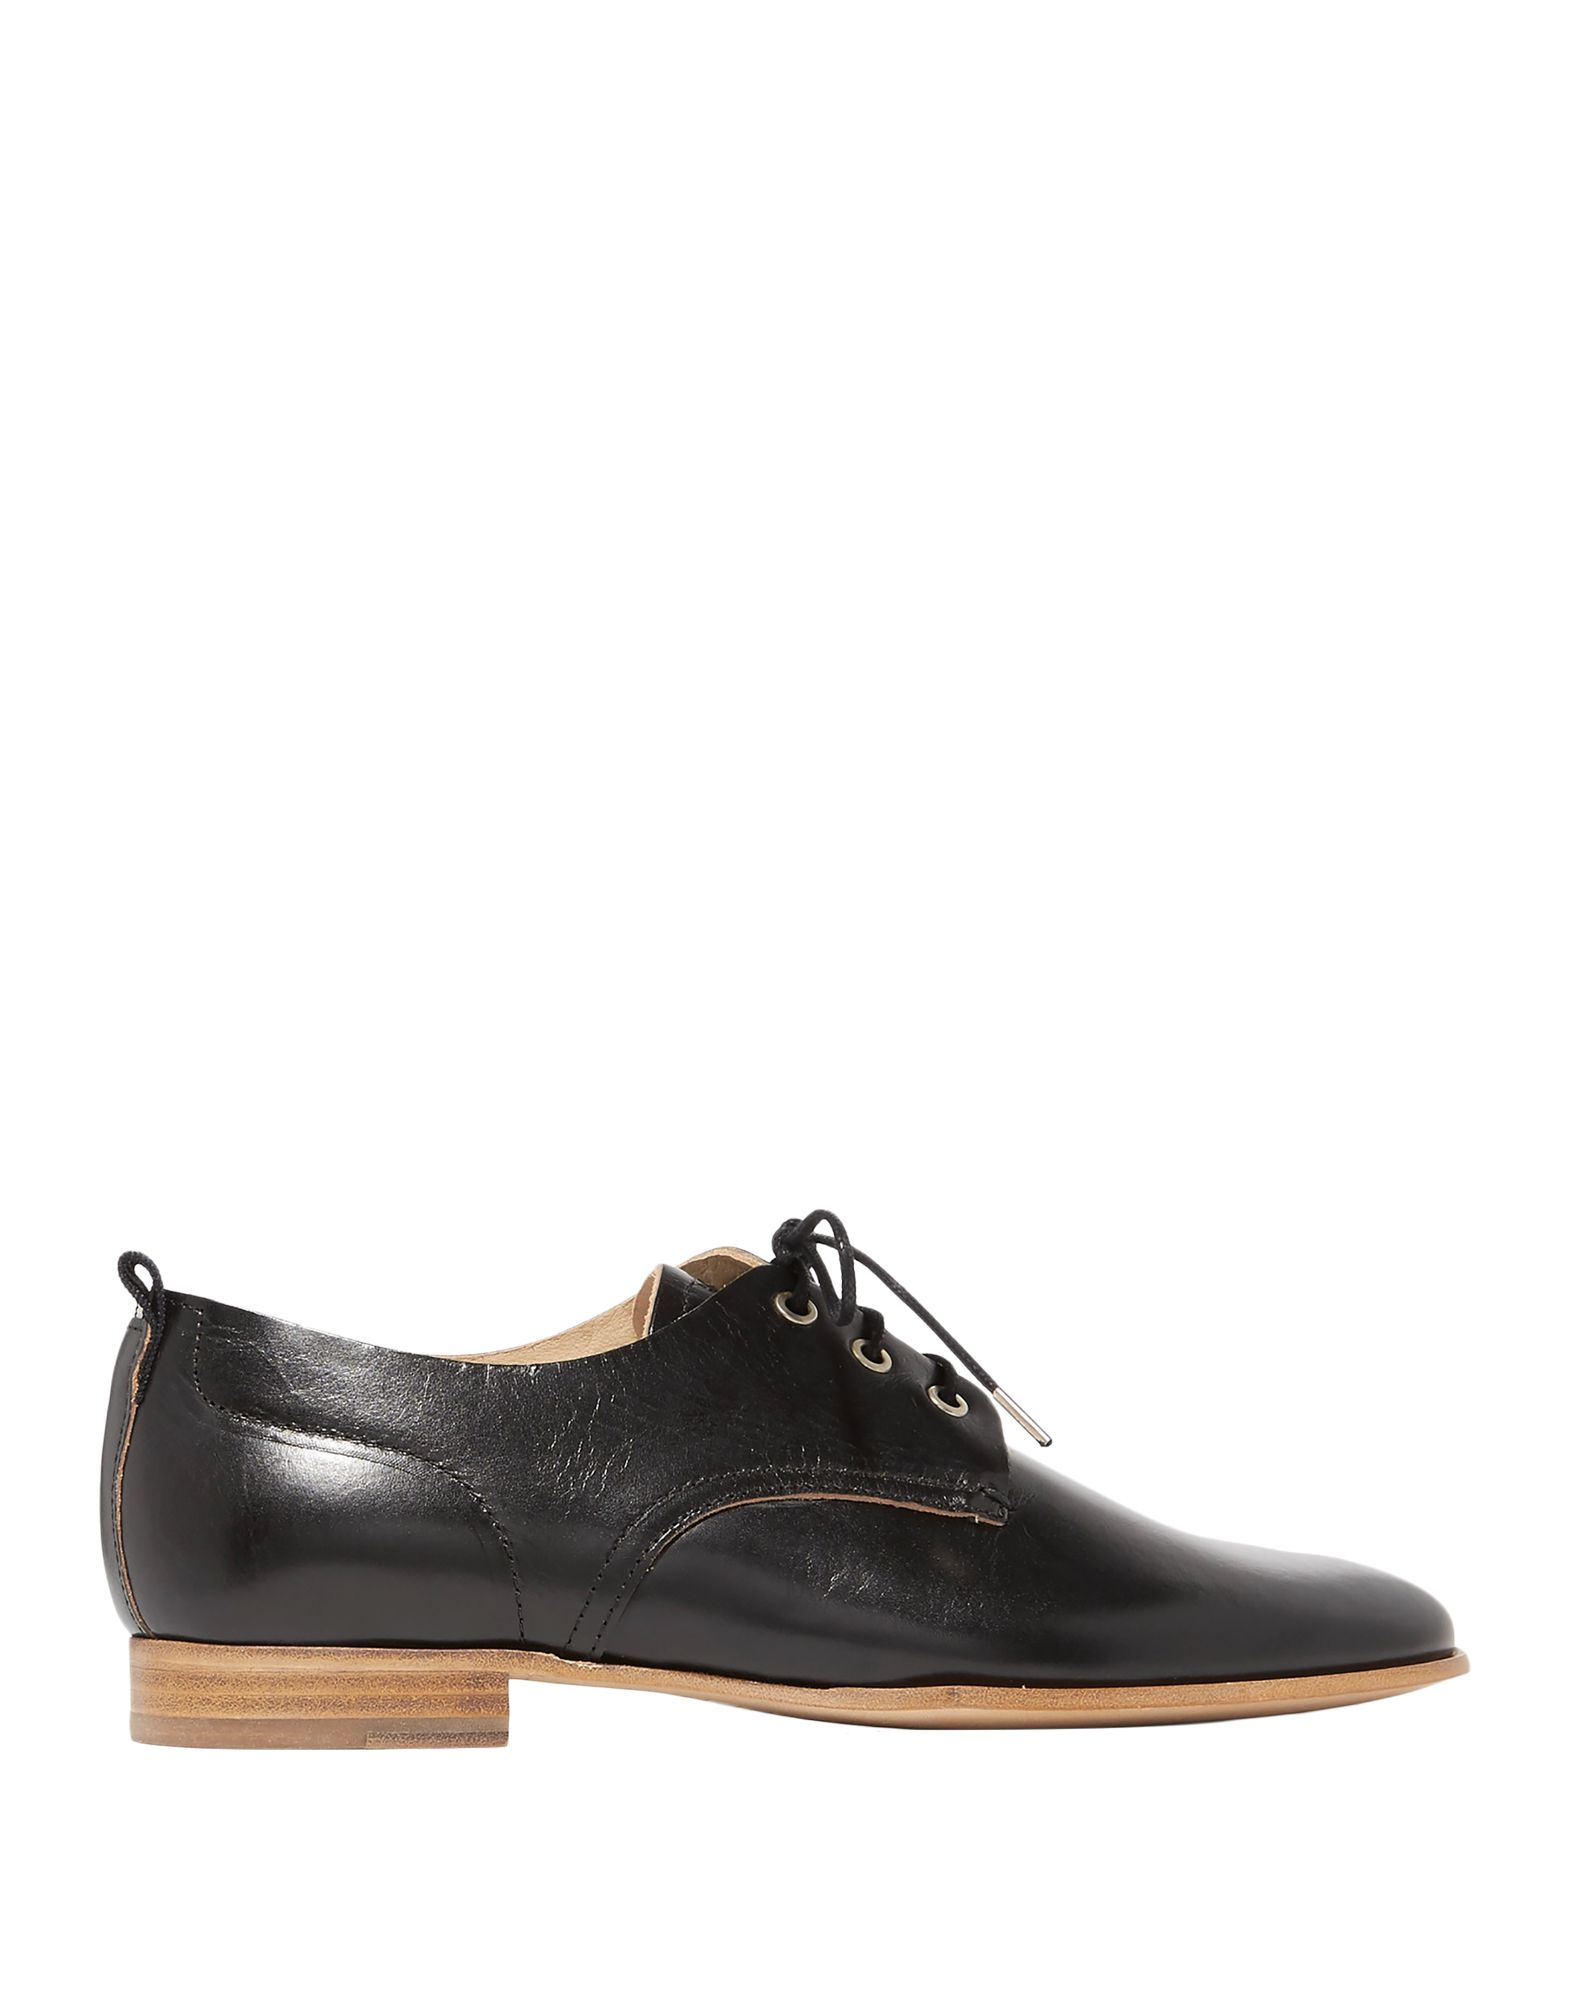 Фото - RAG & BONE Обувь на шнурках обувь на высокой платформе dkny